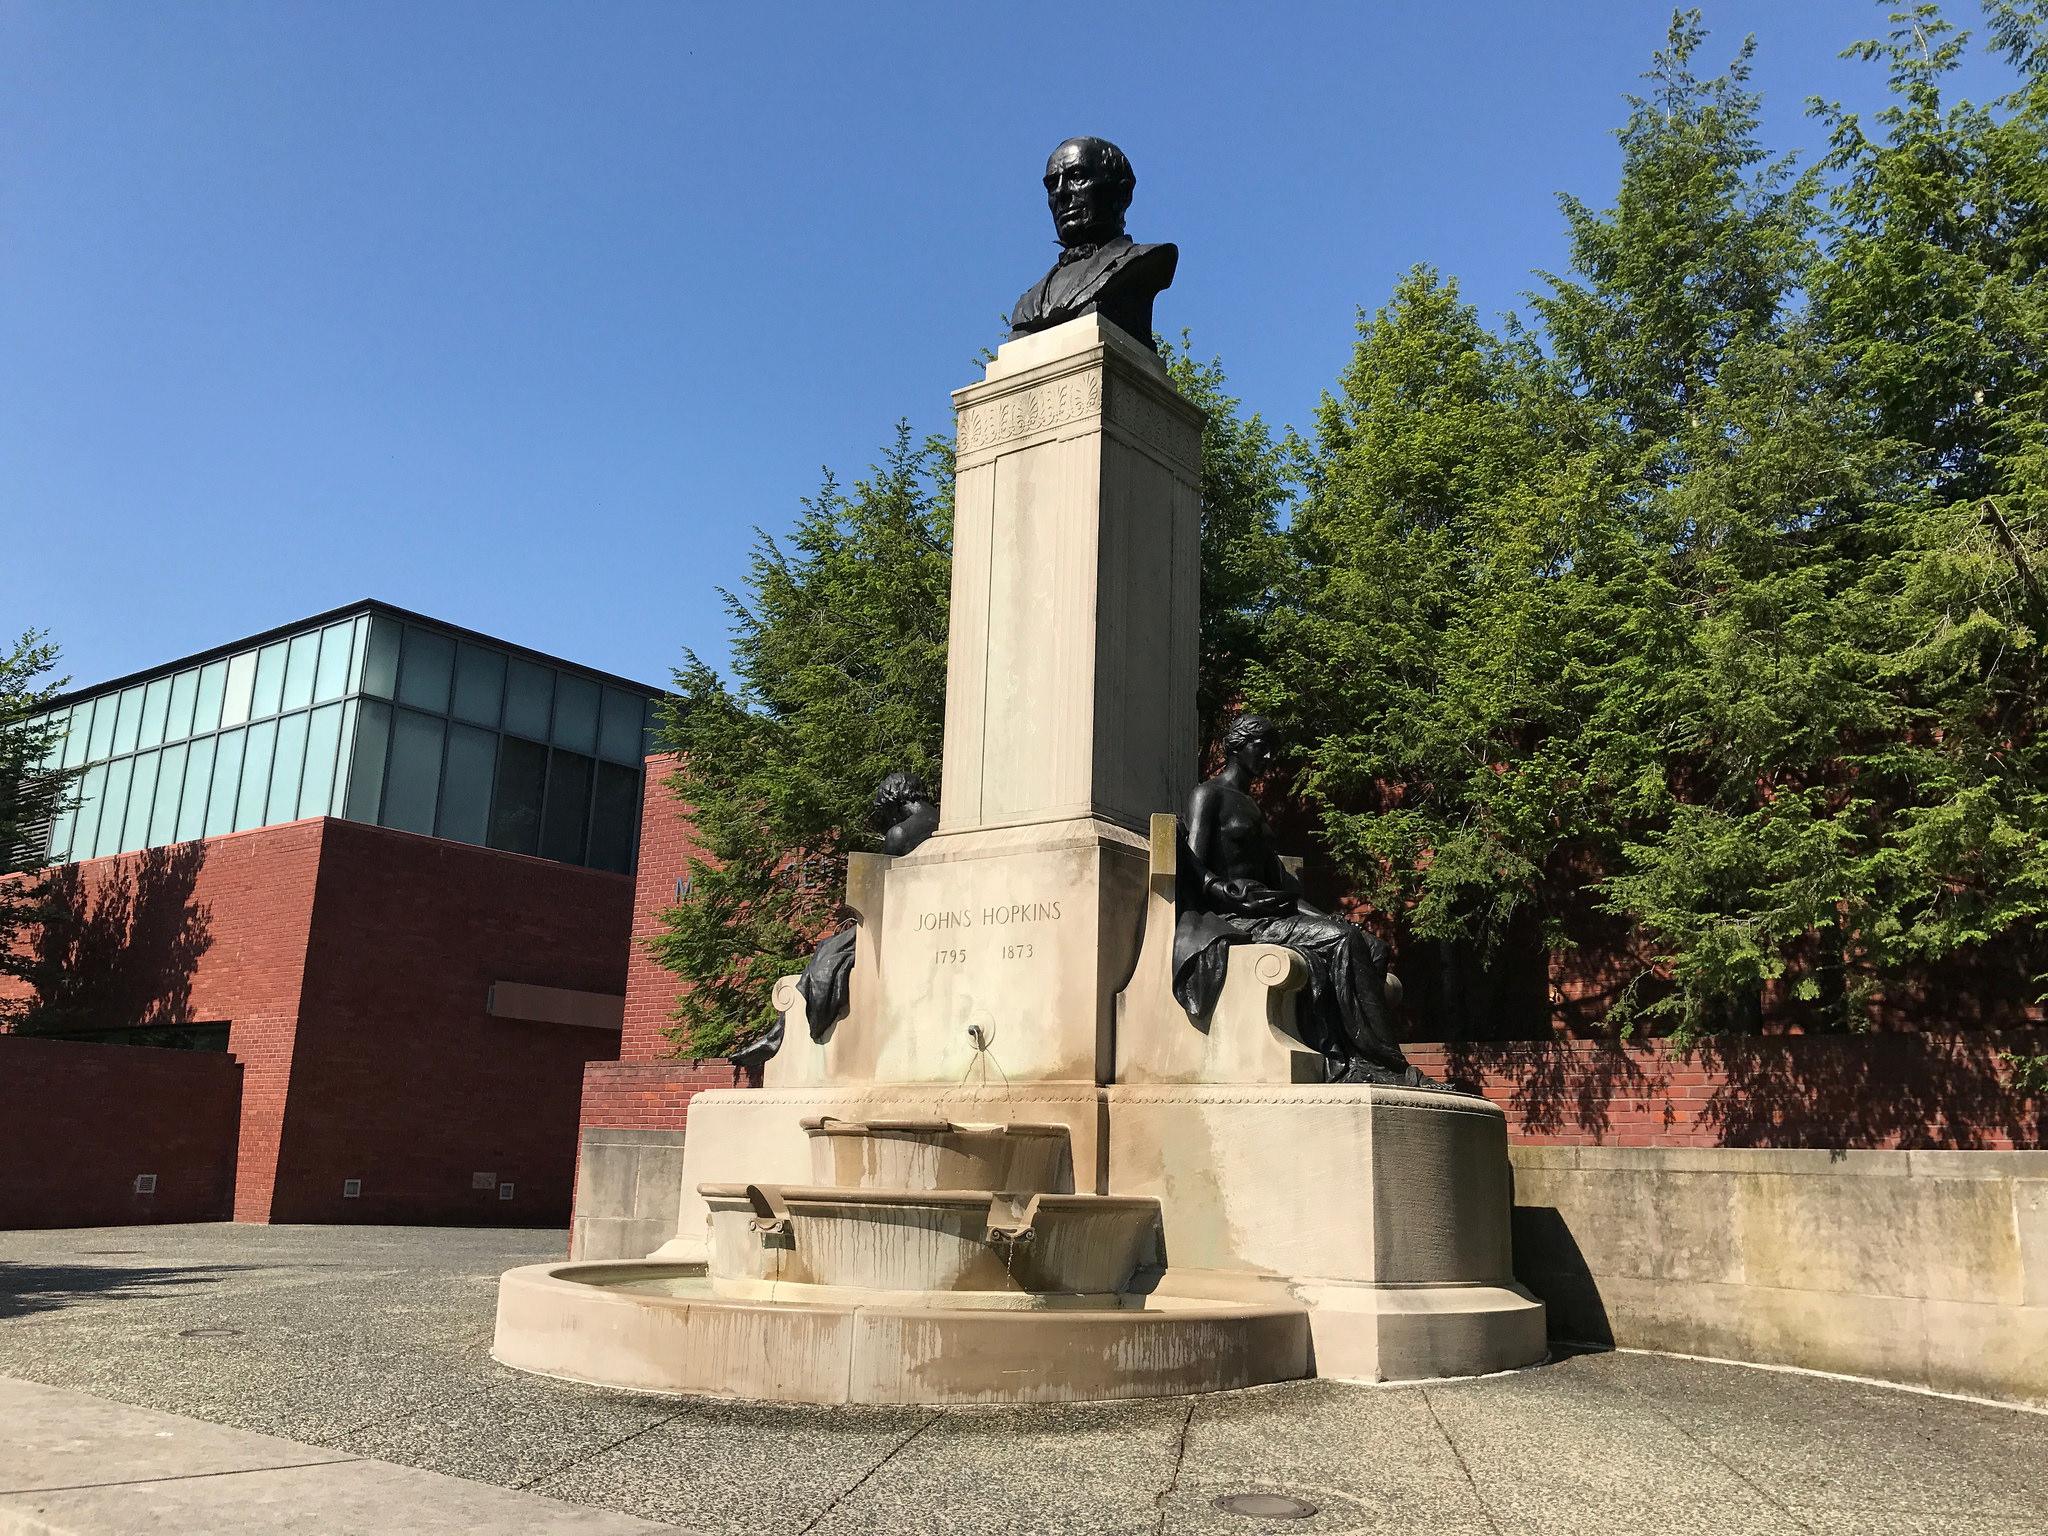 A Brief History of Johns Hopkins University